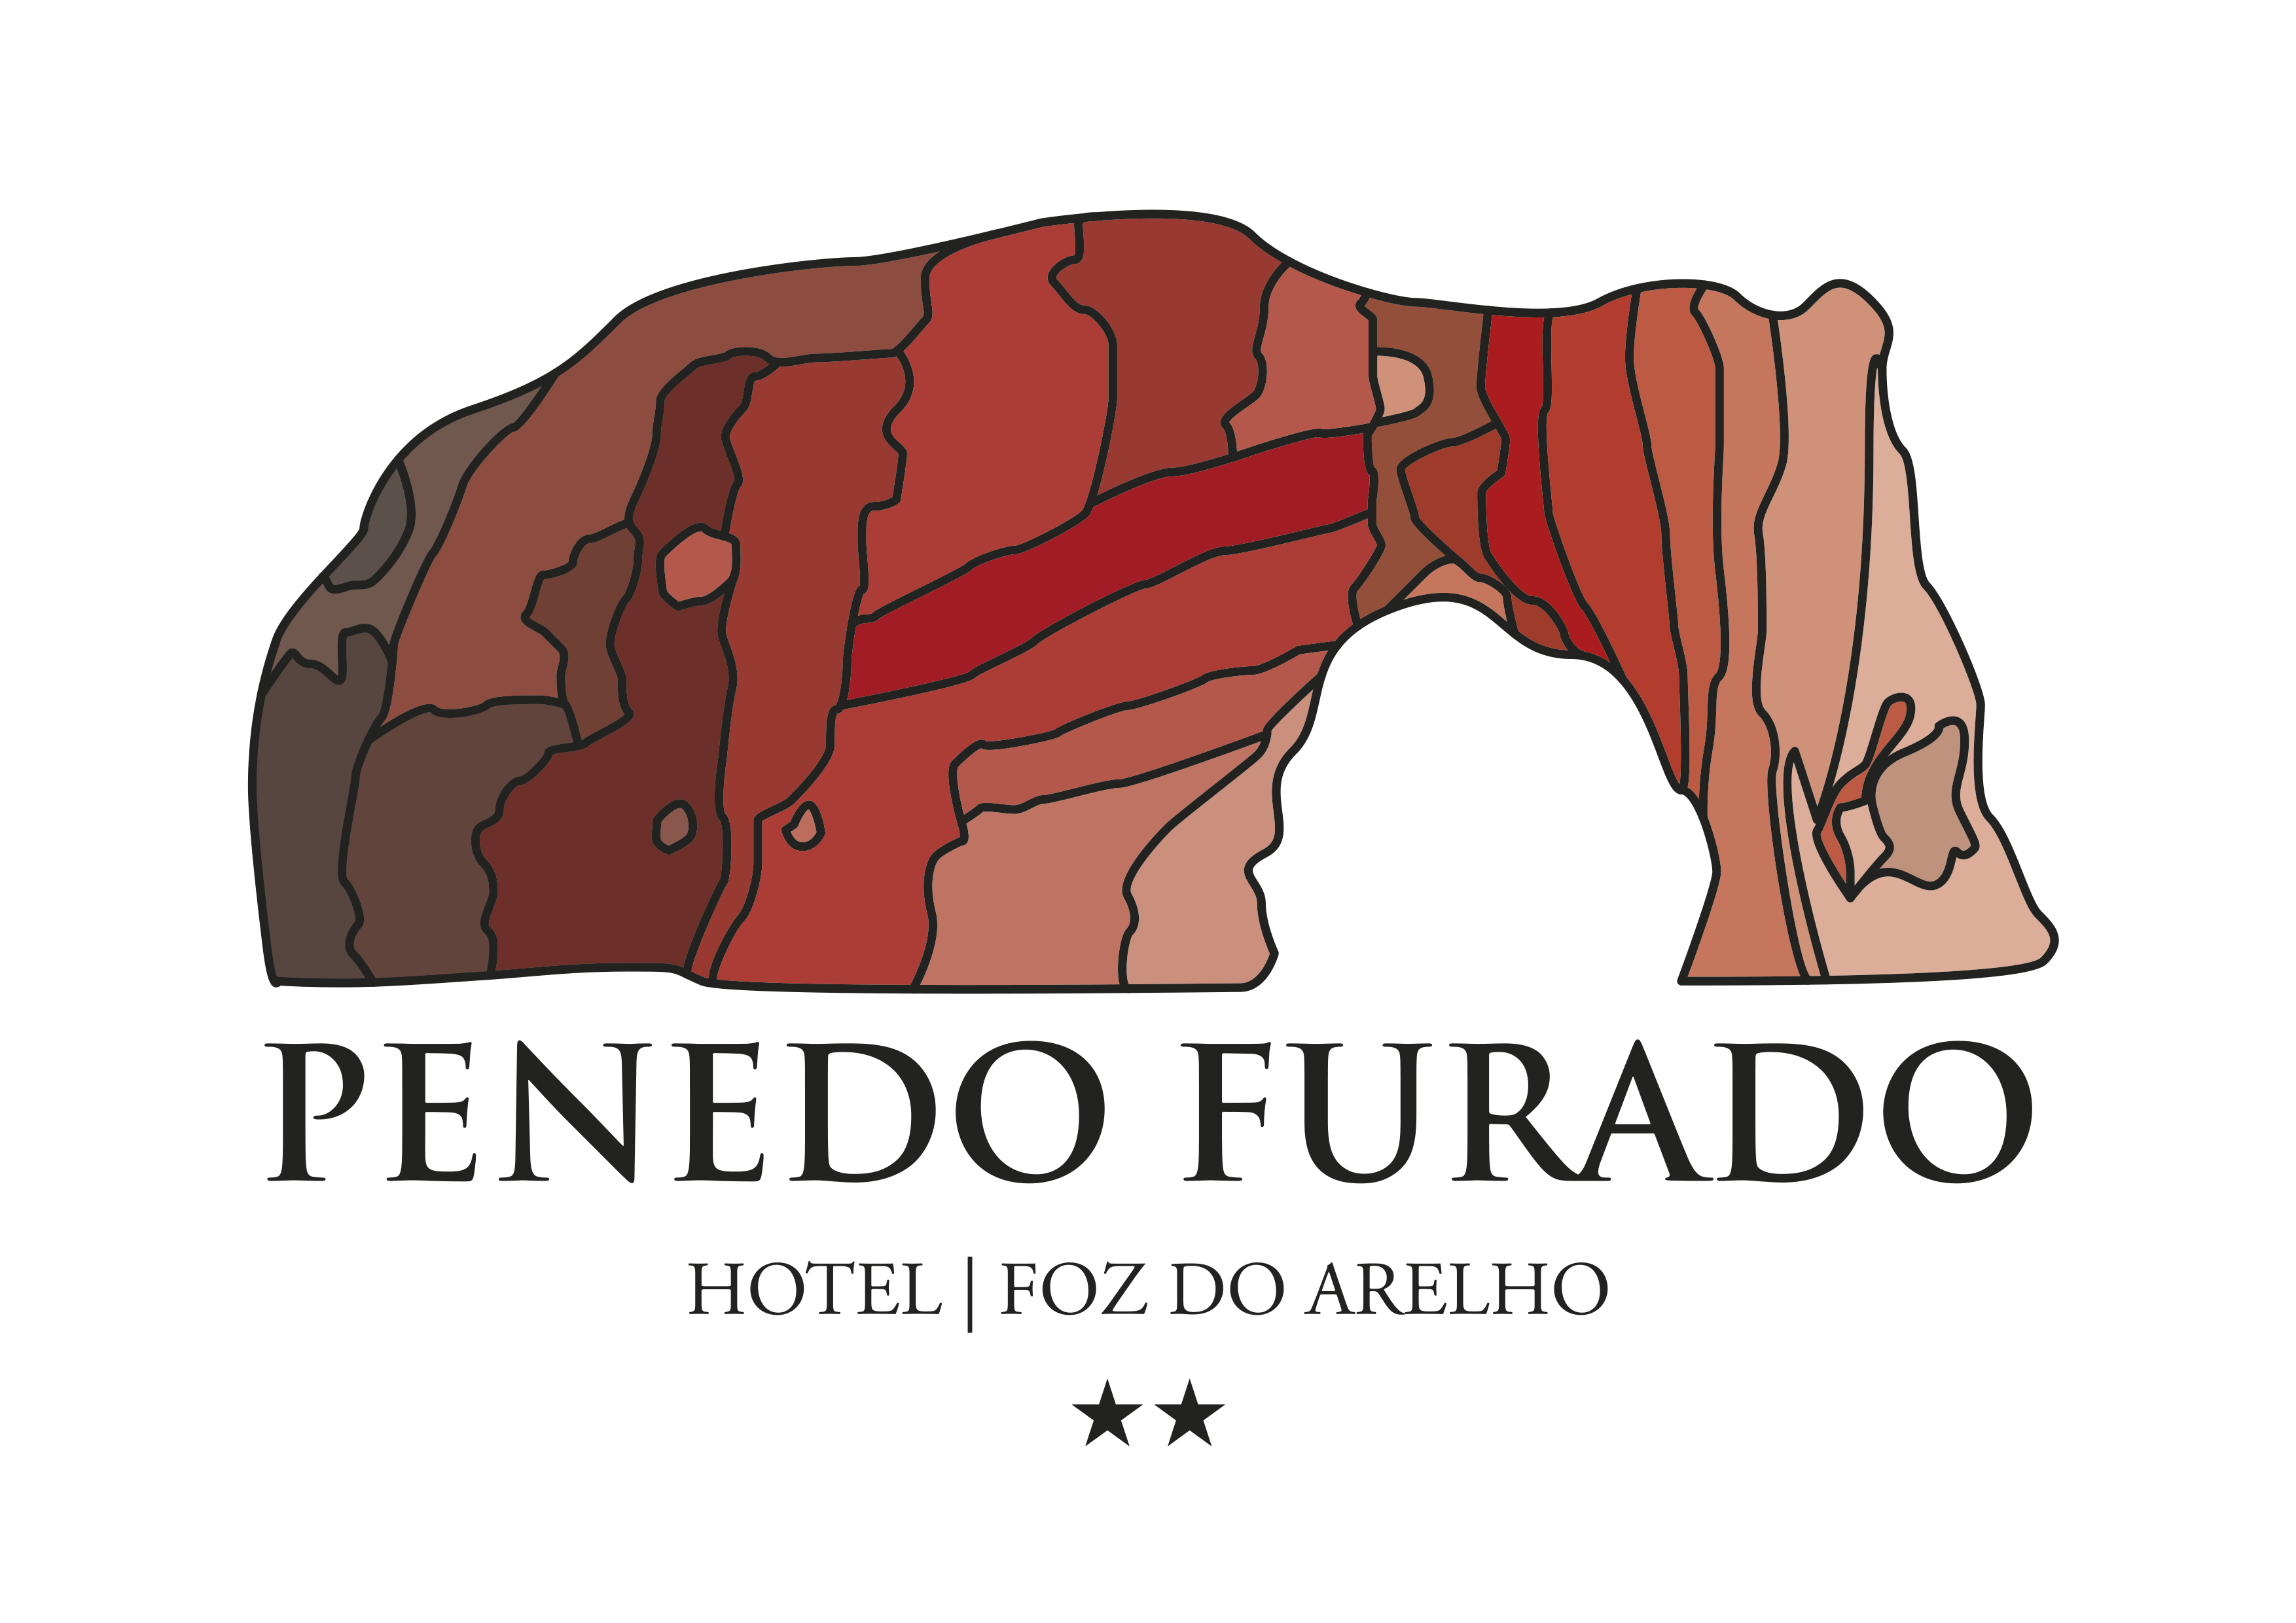 hotel-penedo-furado-LOGOTIPO1